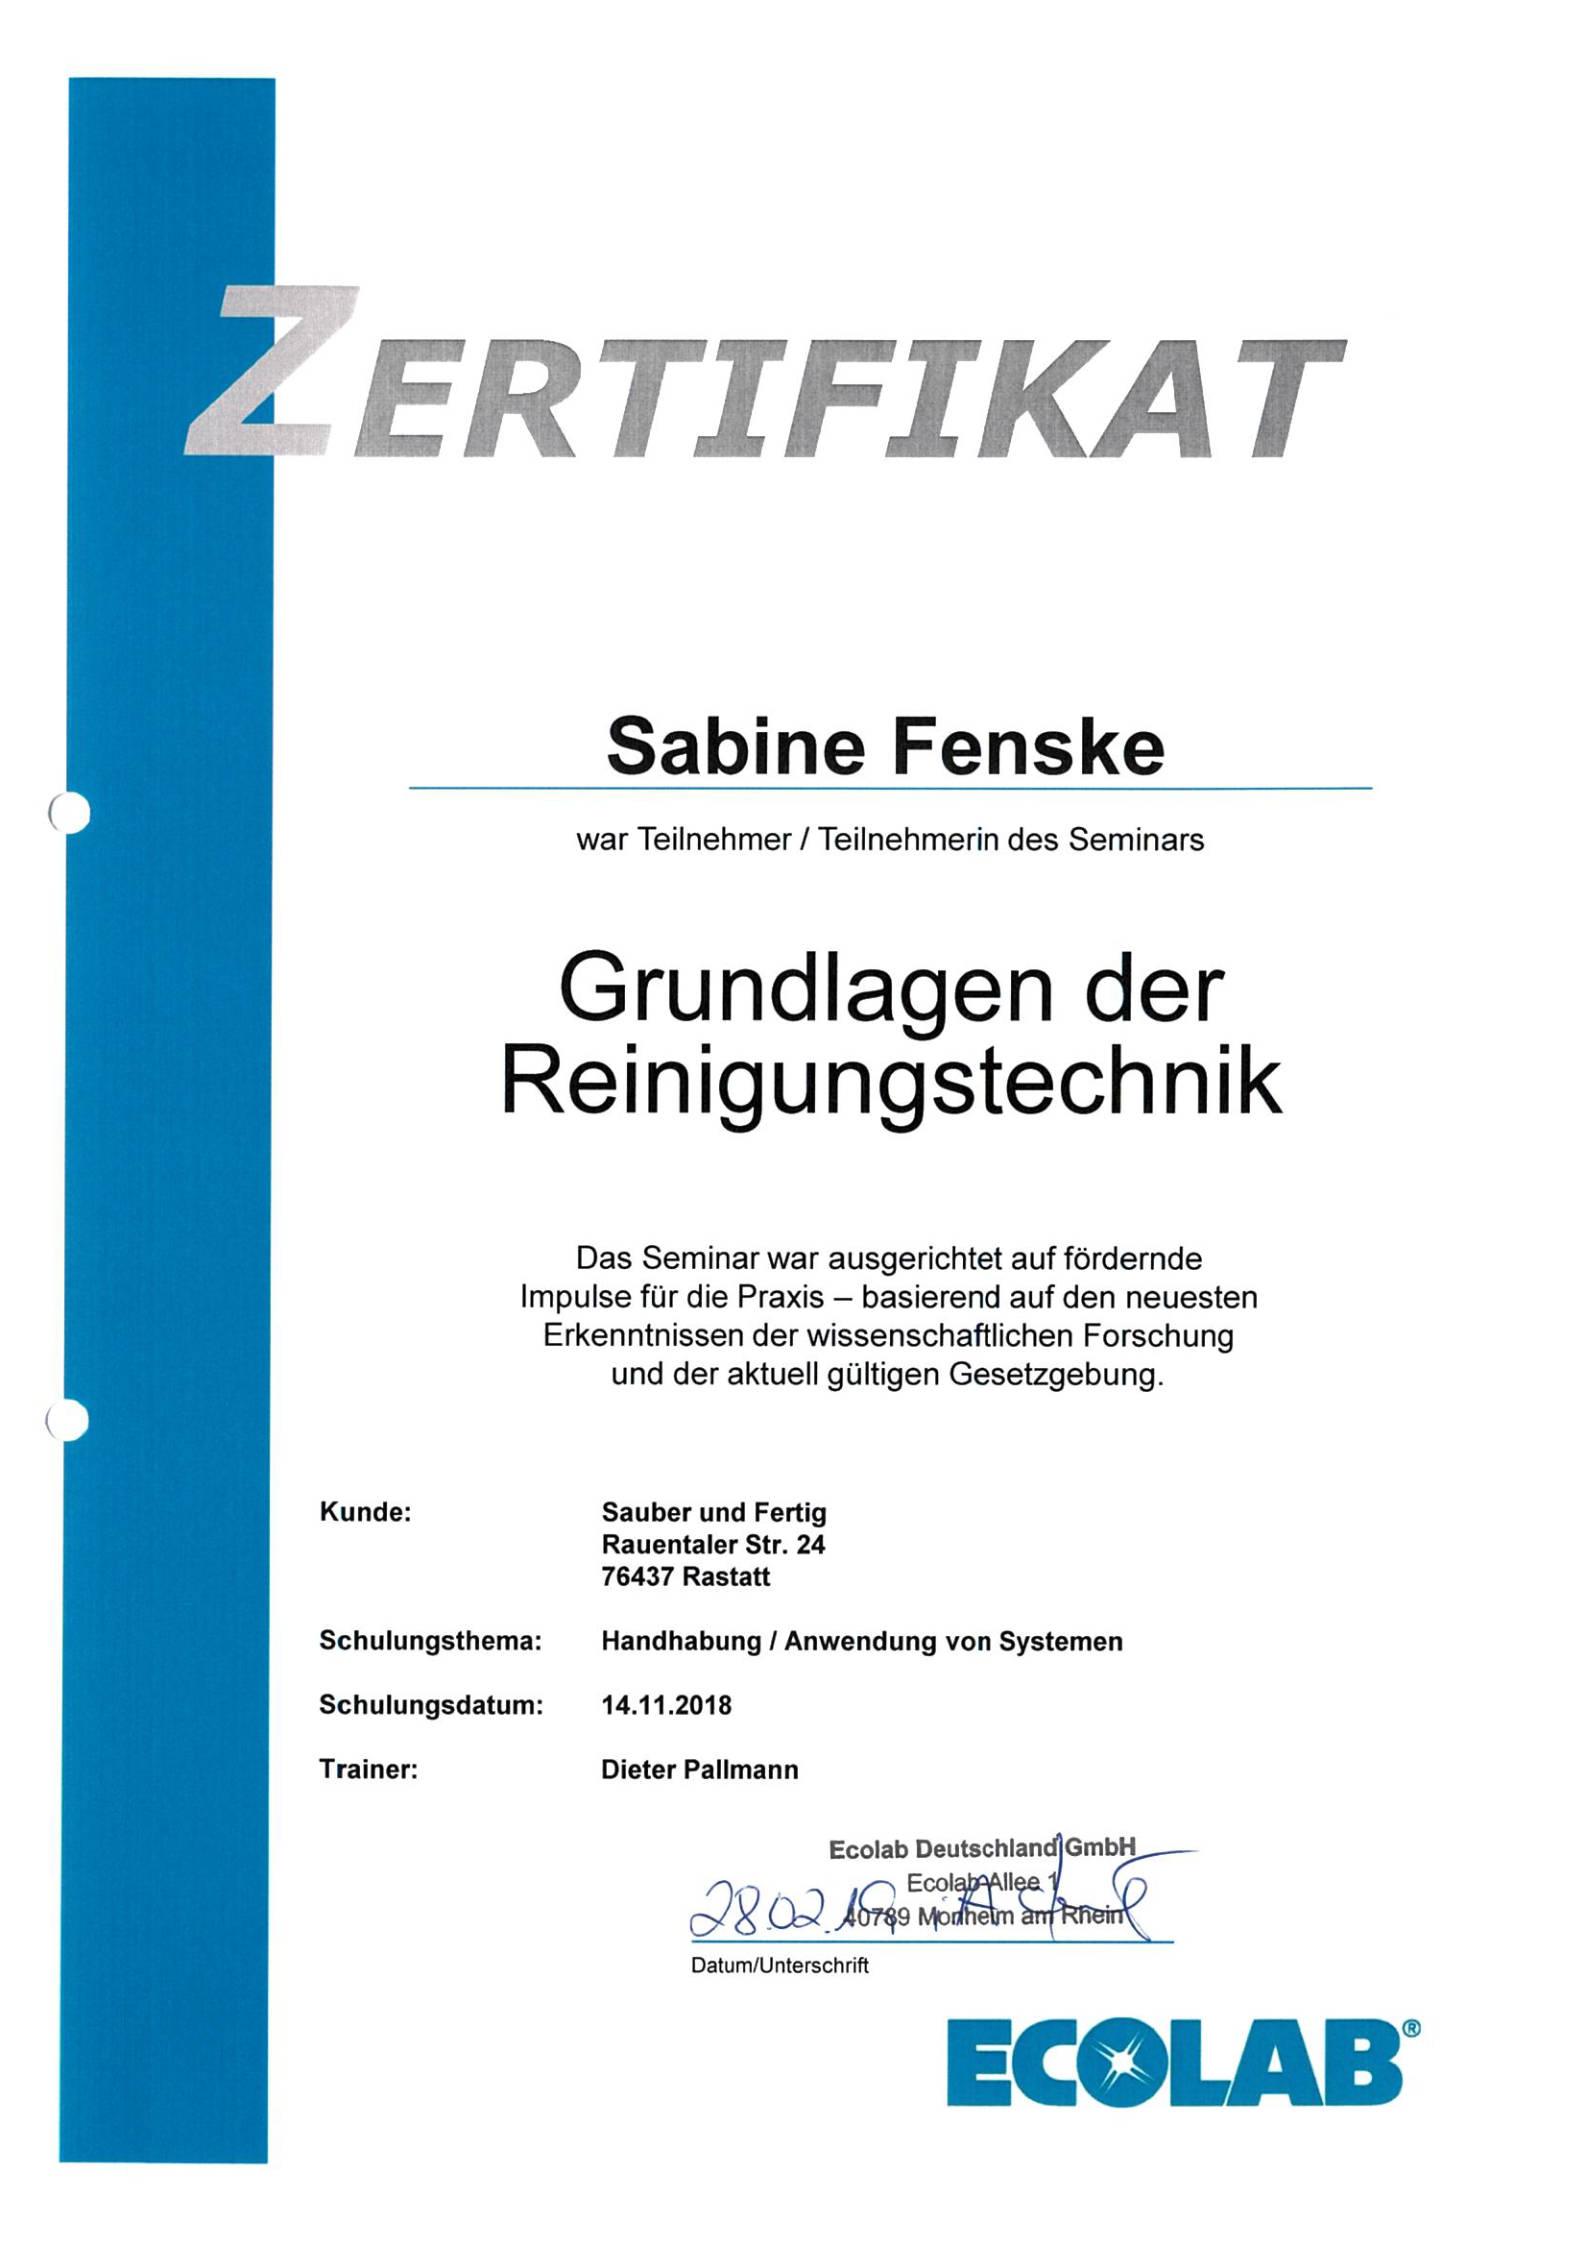 ecolab grundlagen zertifikat